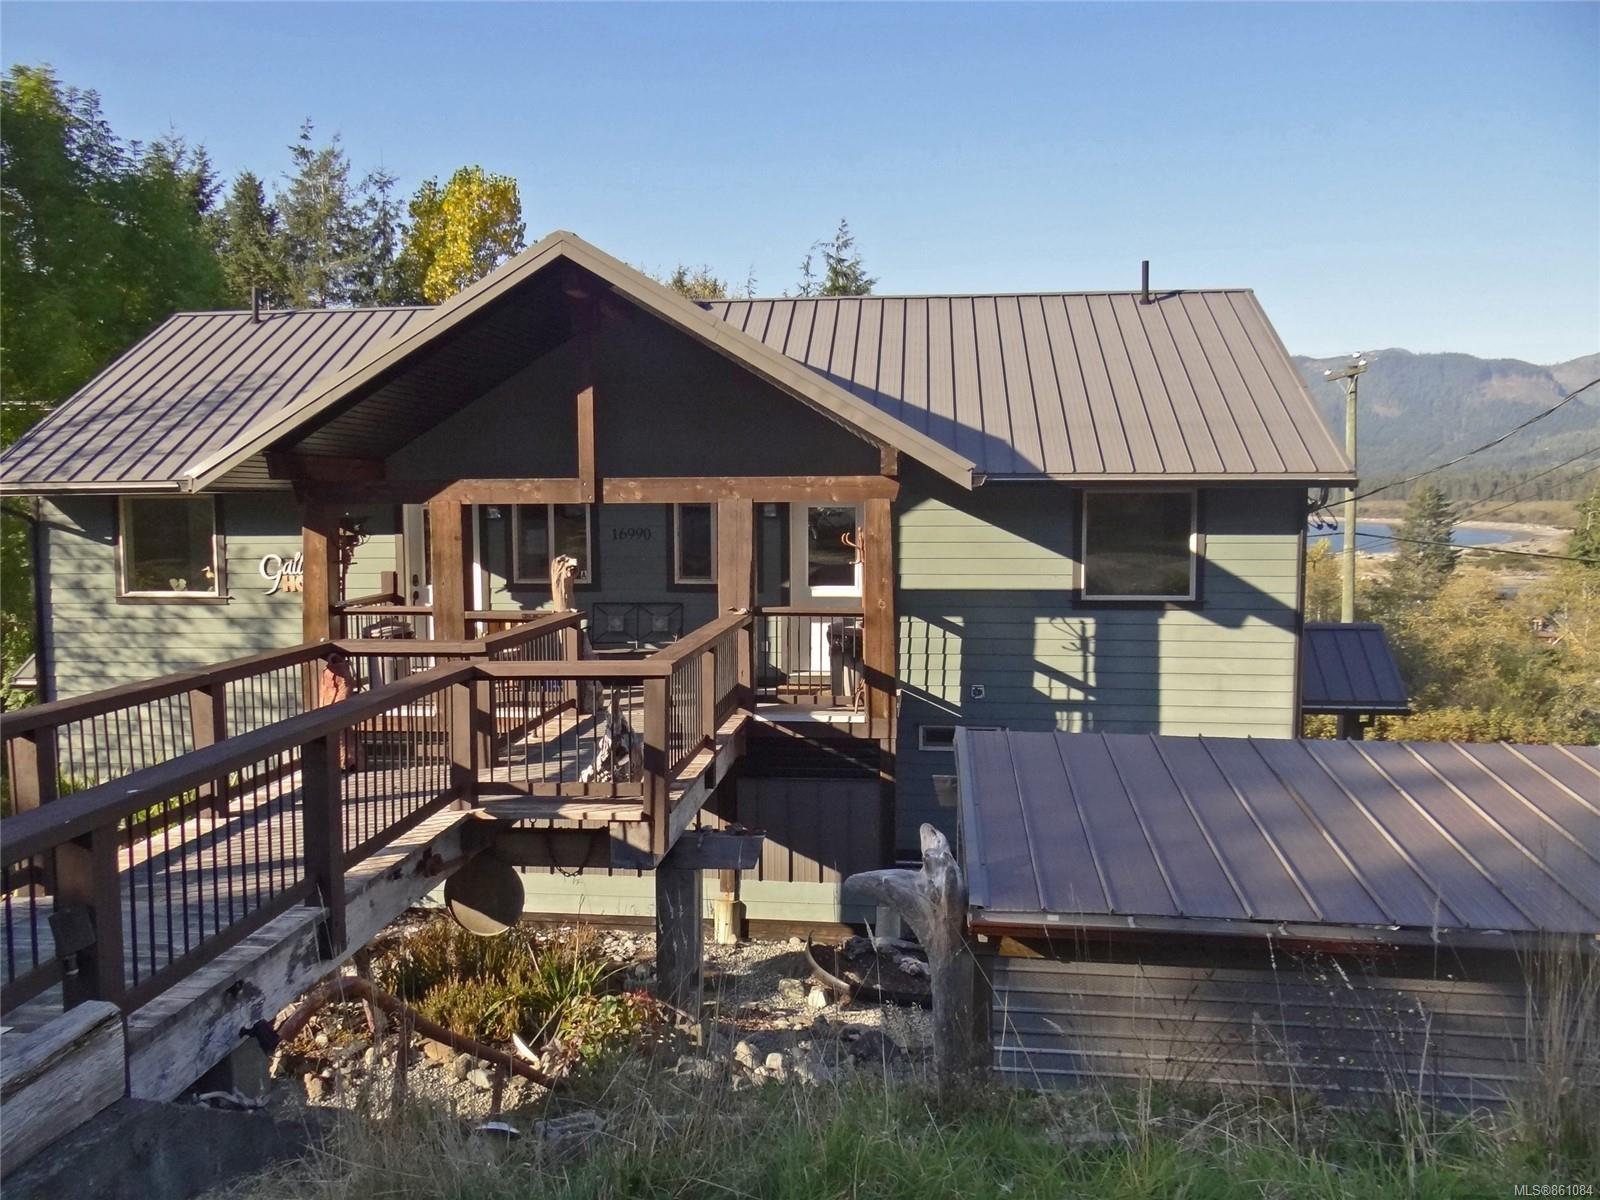 Main Photo: A 16990 Wickanninish Rd in : Sk Port Renfrew Half Duplex for sale (Sooke)  : MLS®# 861084